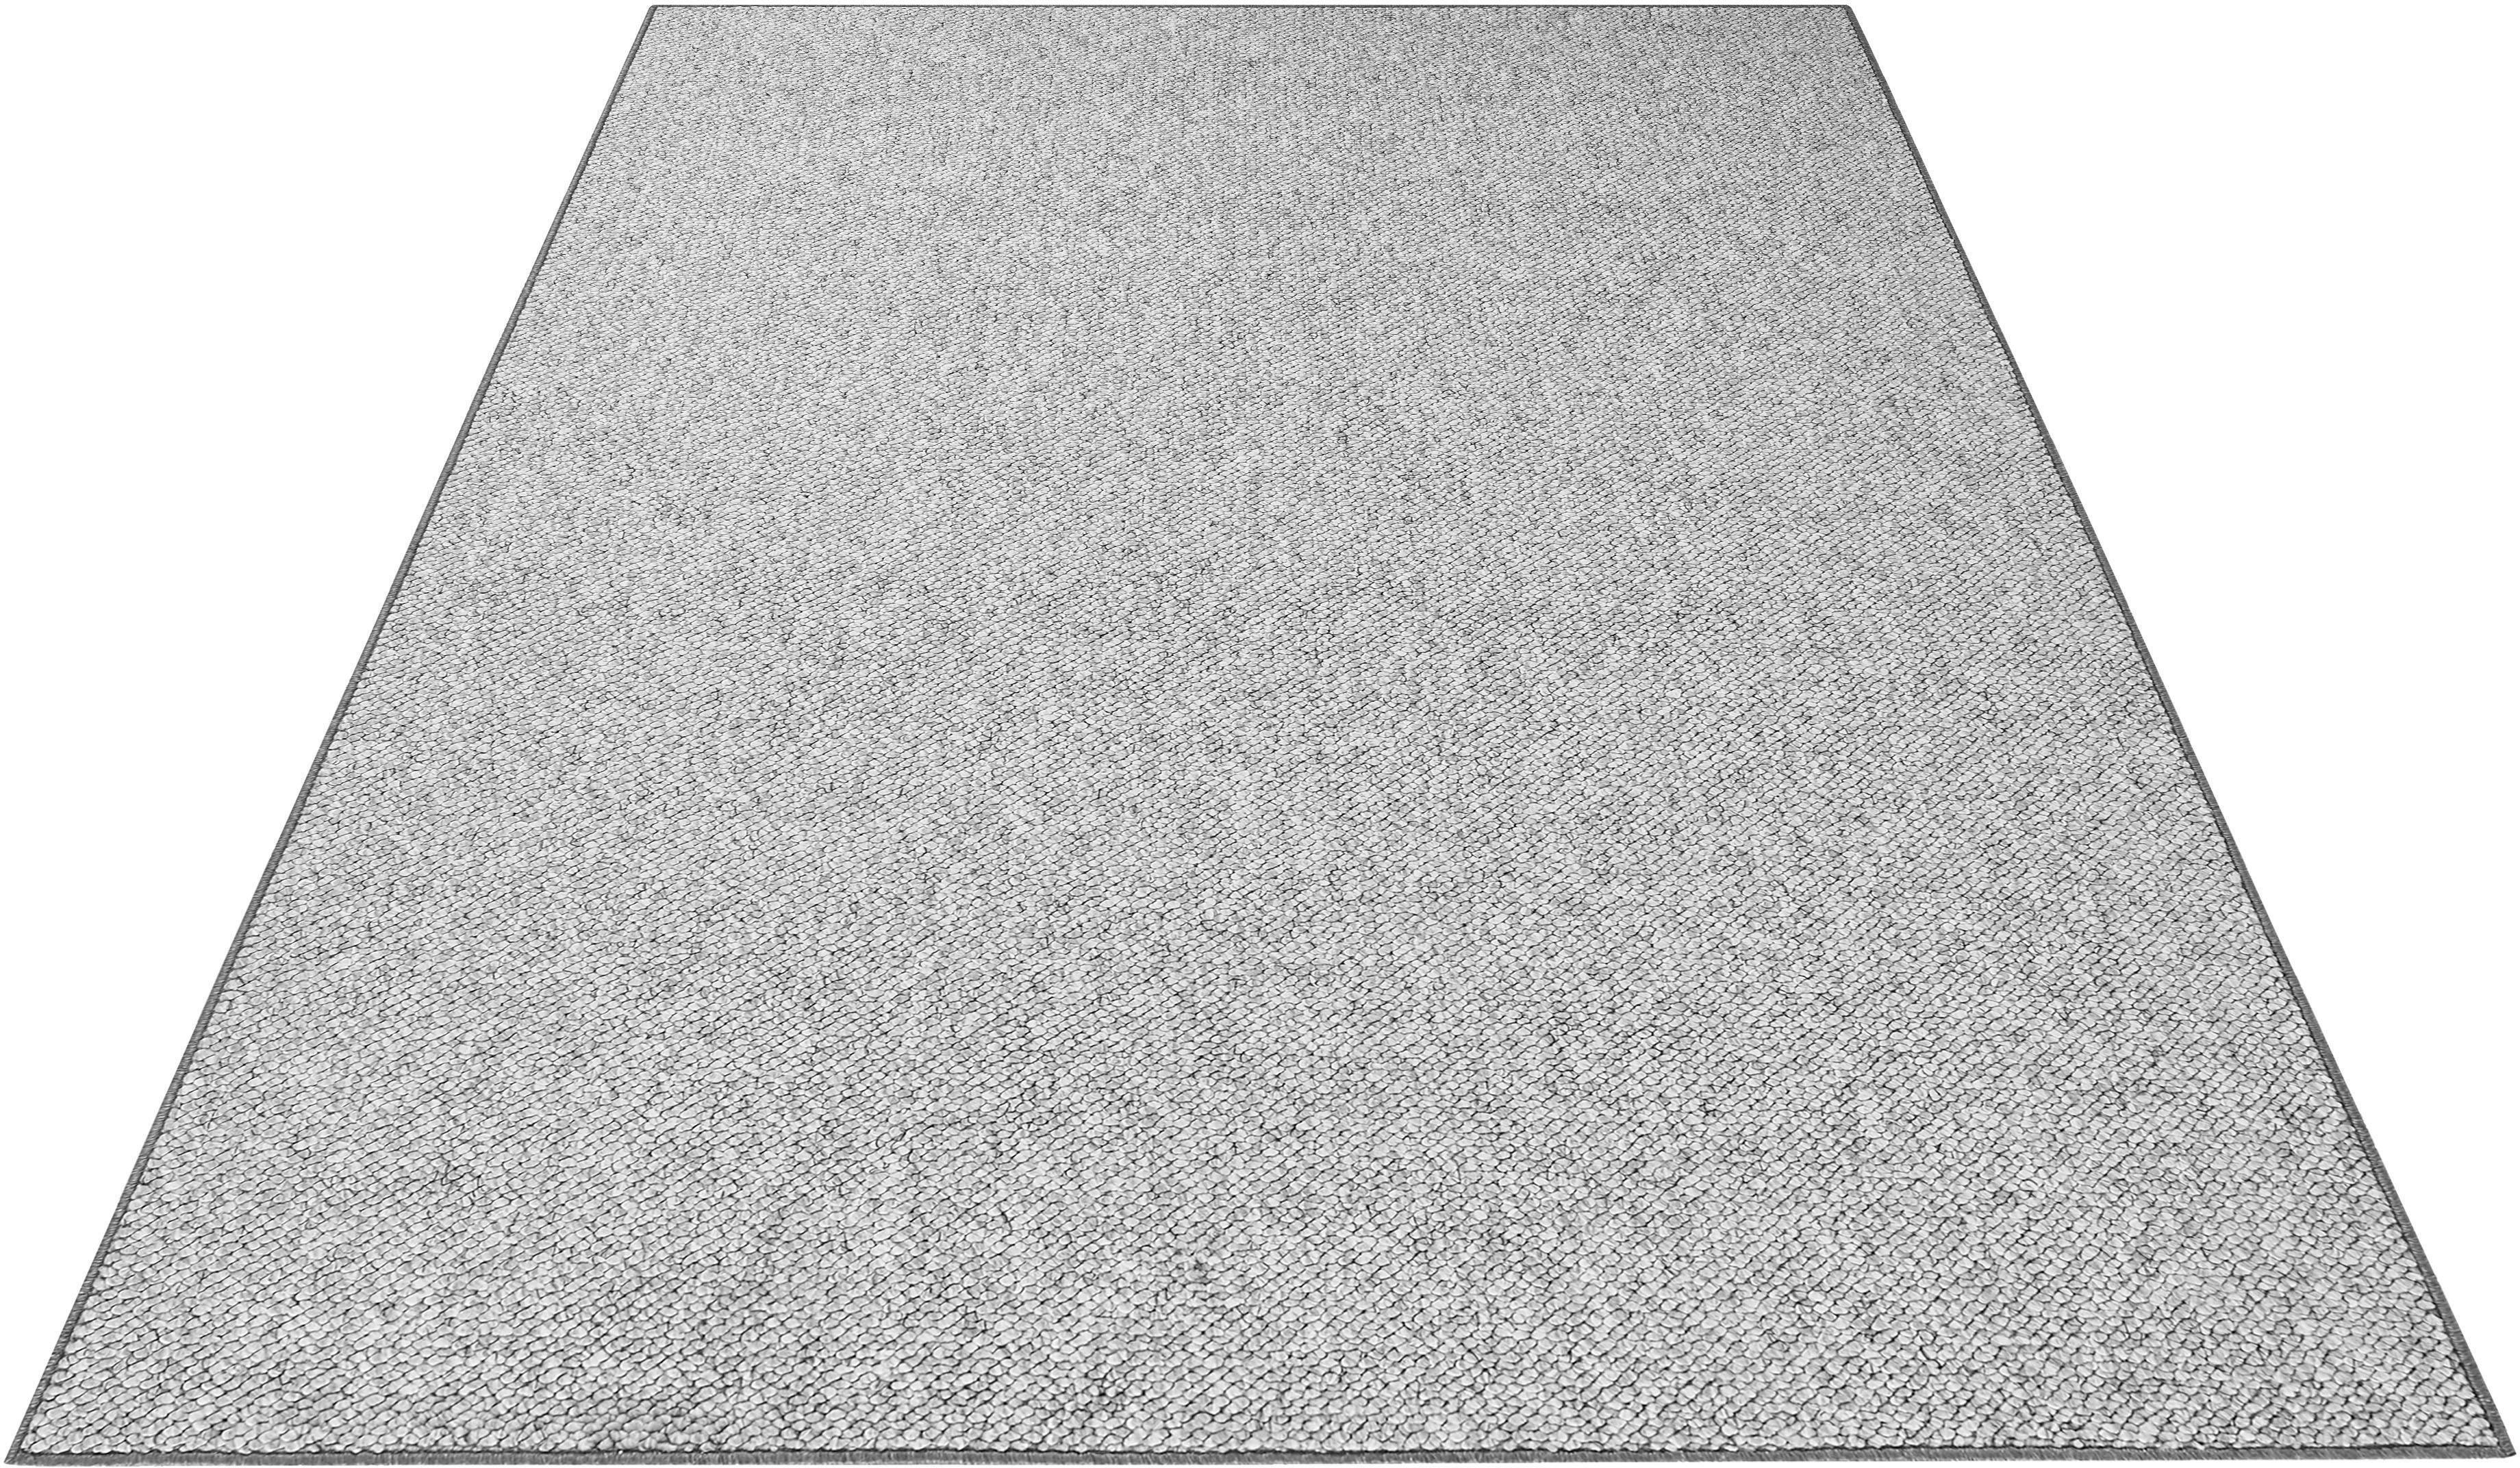 BT Carpet Vloerkleed, »Wolly 2«, rechthoekig, hoogte 12 mm, machinaal getuft - verschillende betaalmethodes